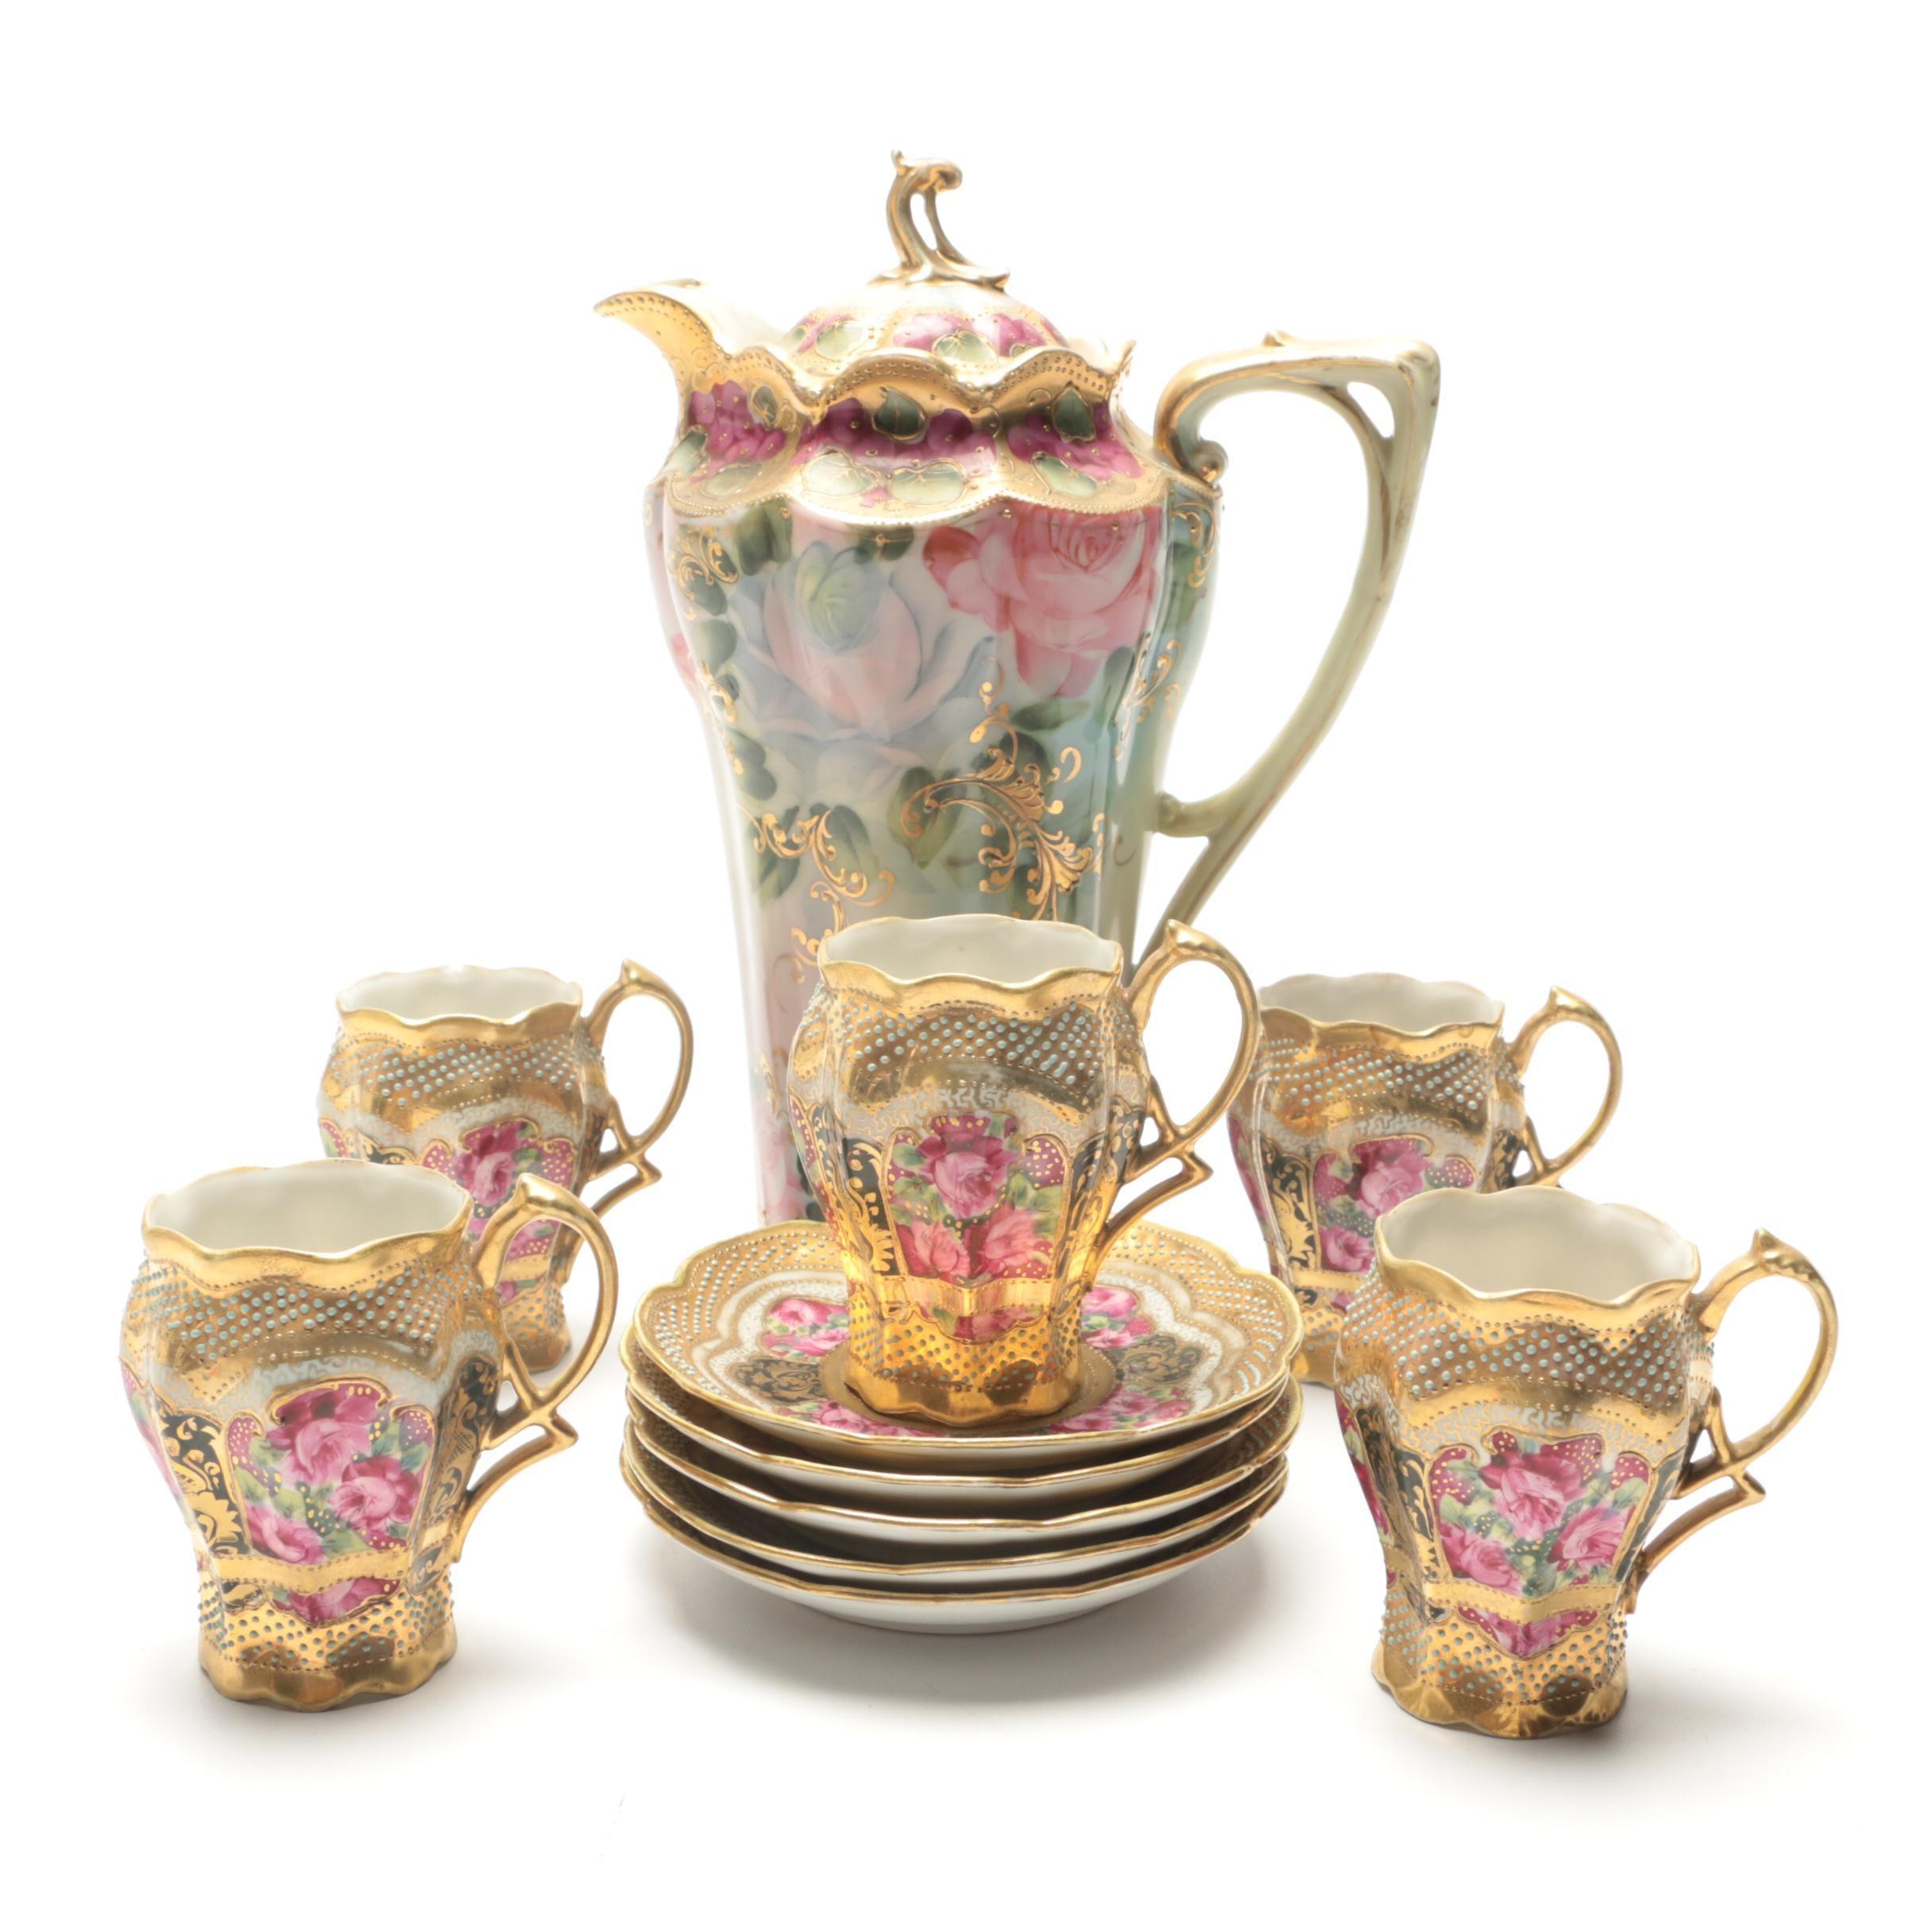 Hand-Painted Nippon Porcelain Serveware